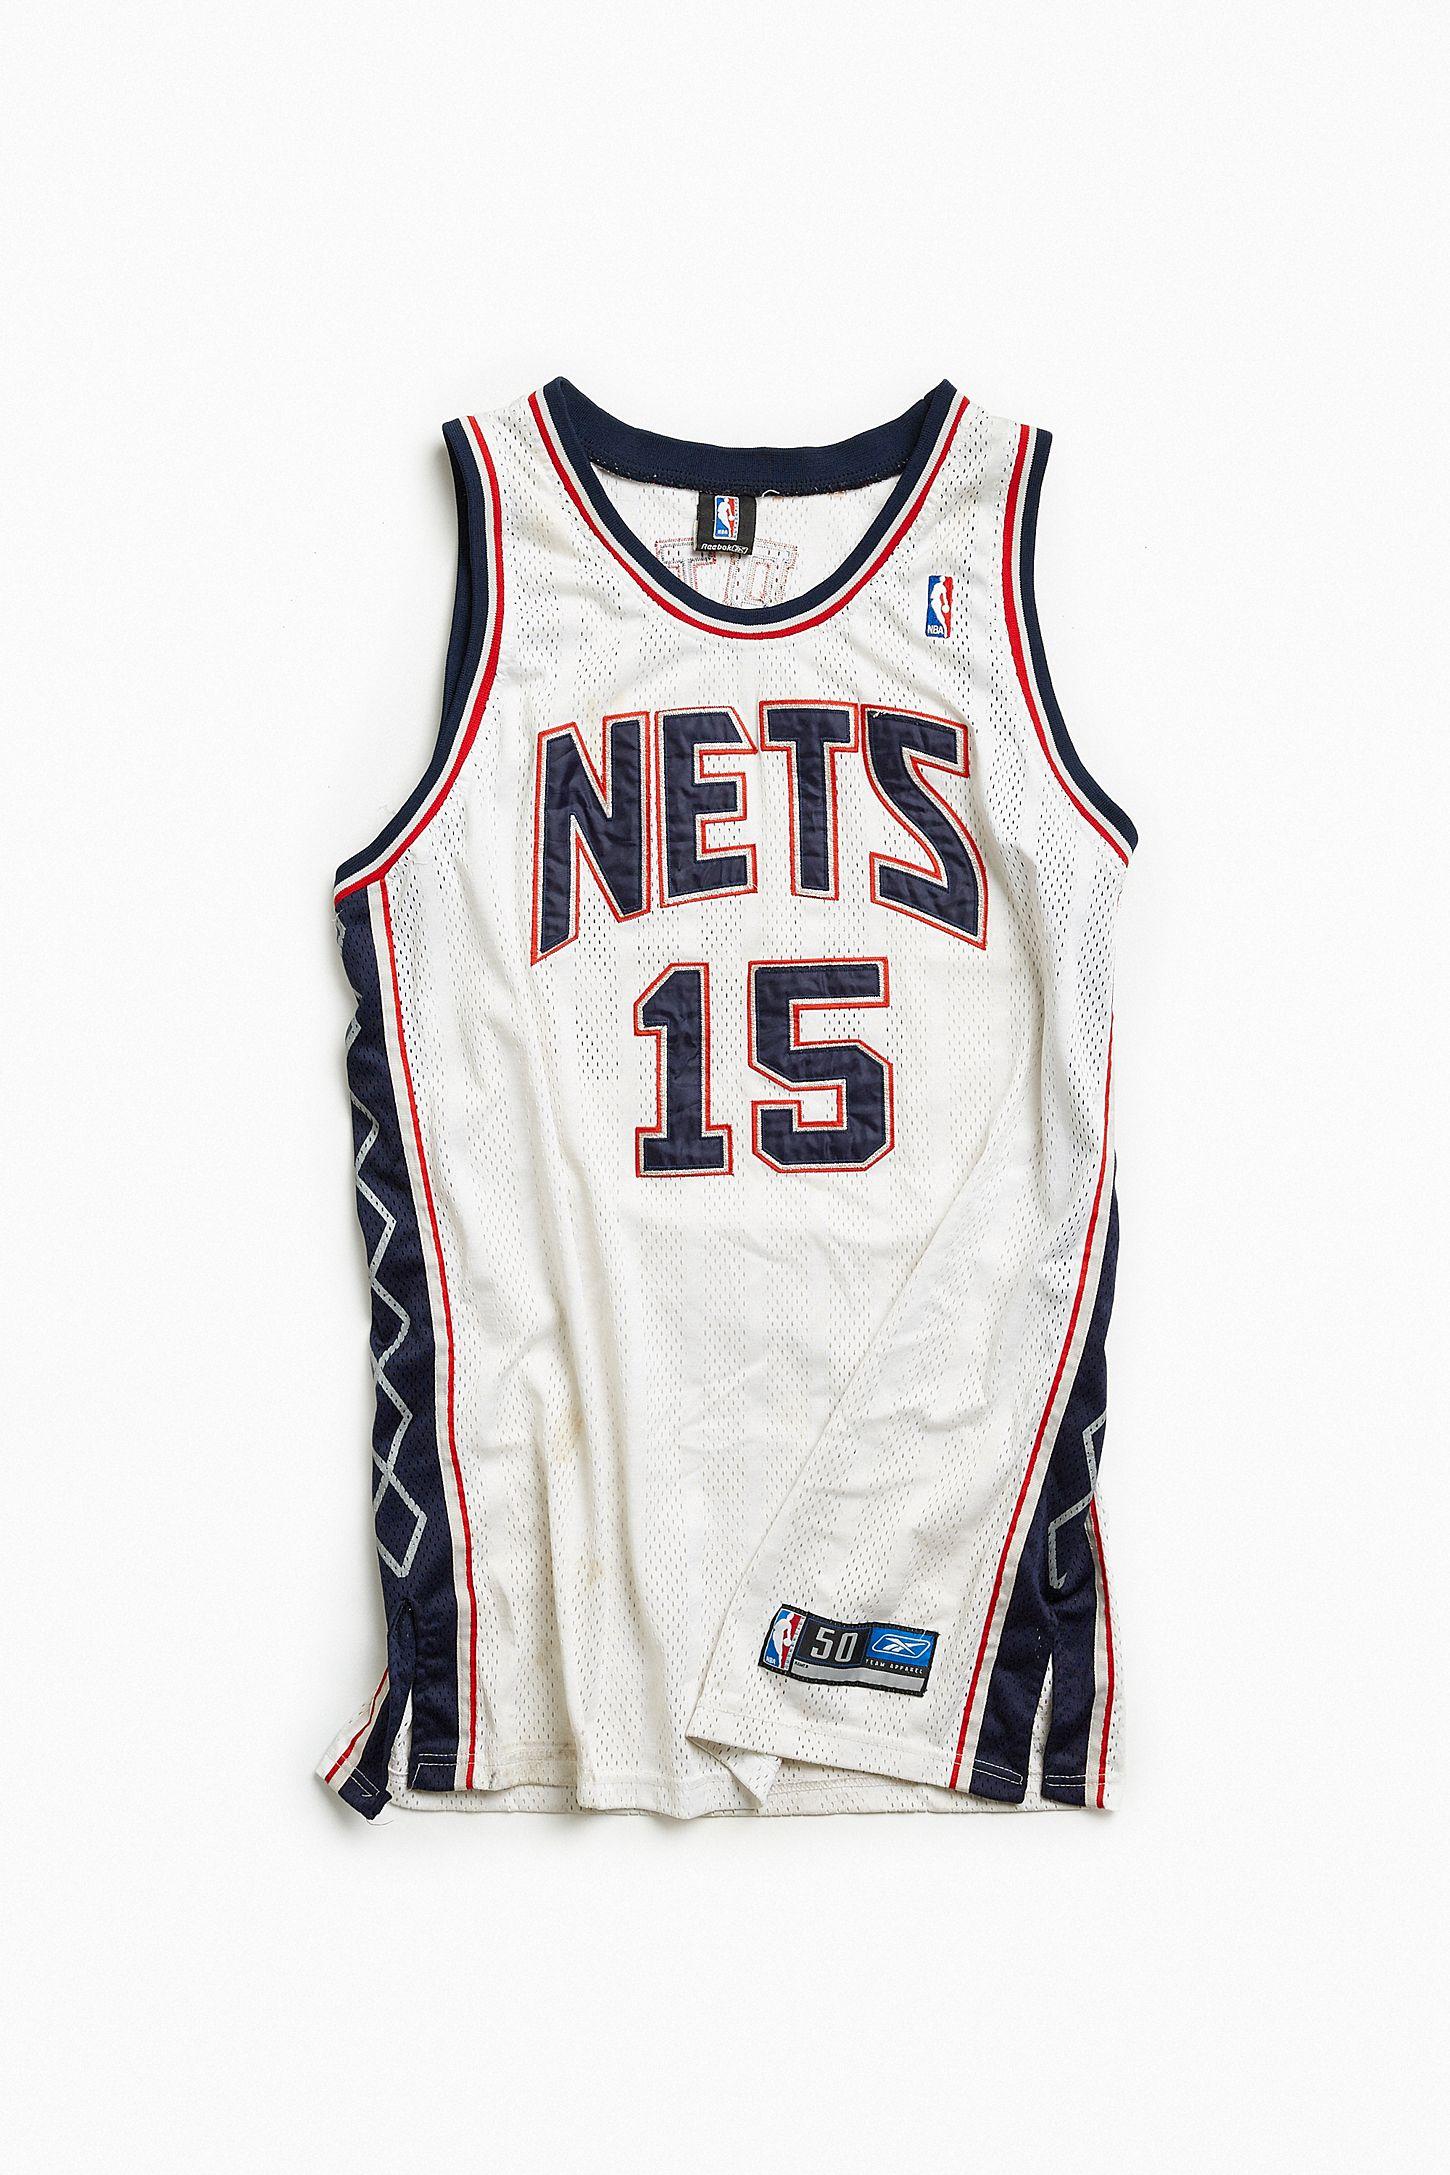 Vintage NBA New Jersey Nets Vince Carter Basketball Jersey  c9abf96c3